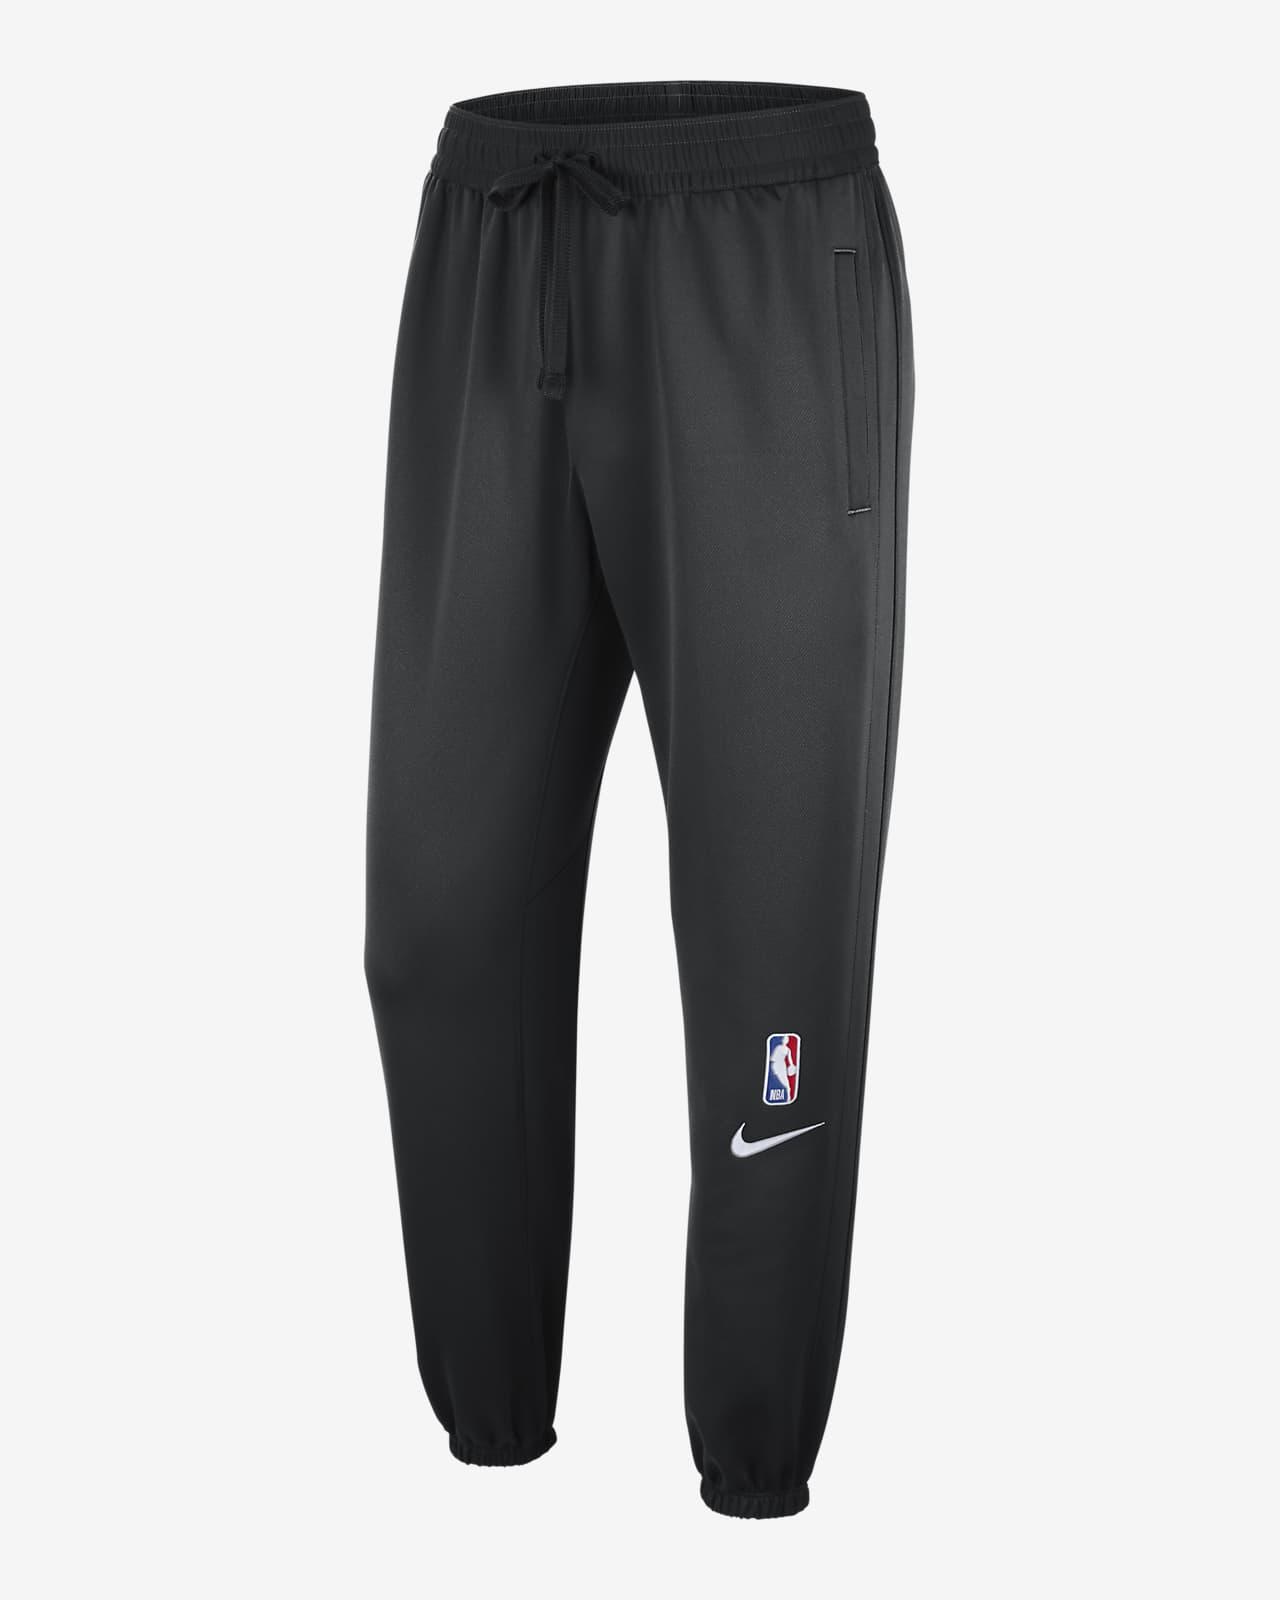 Brooklyn Nets Showtime Men's Nike Therma Flex NBA Trousers